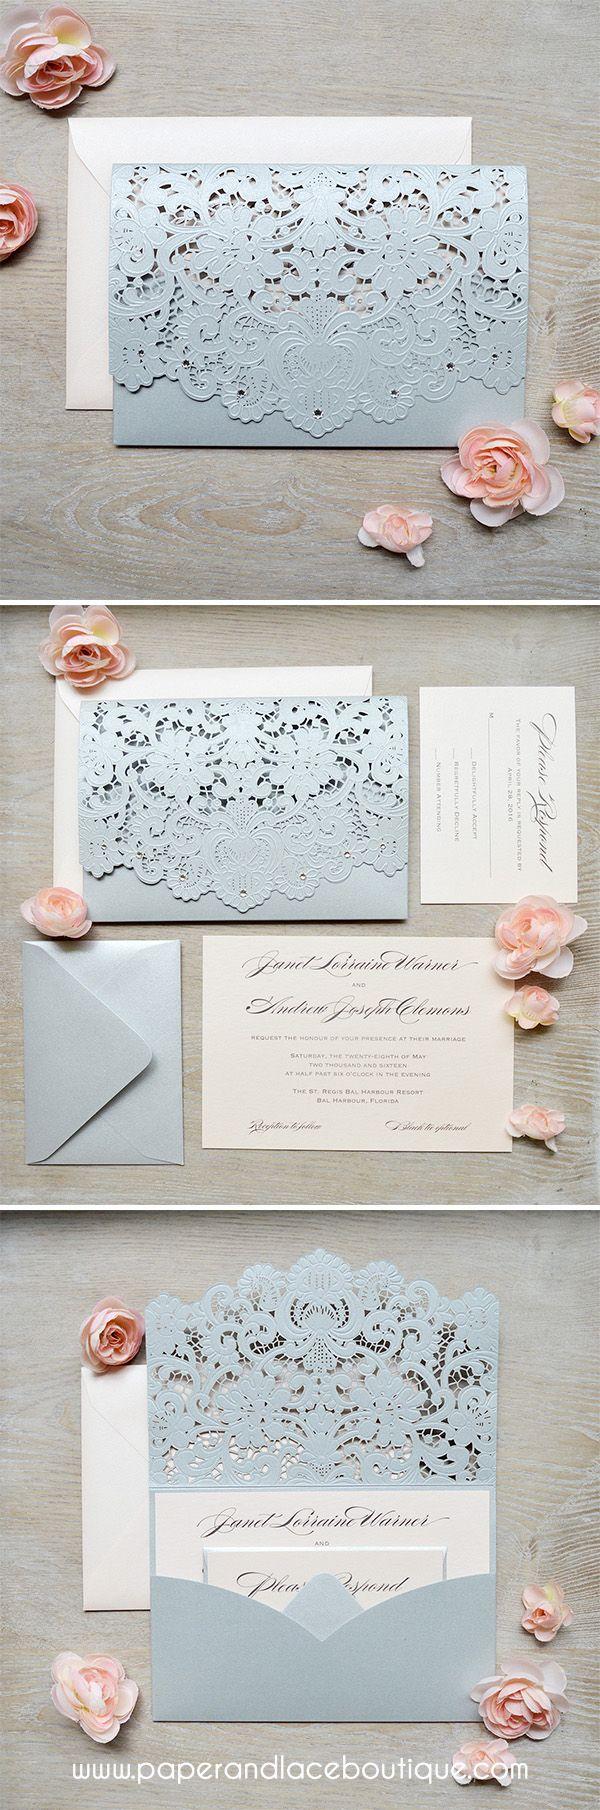 wedding invitations wedding stationery Silver and Blush Laser Cut Wedding Invitations